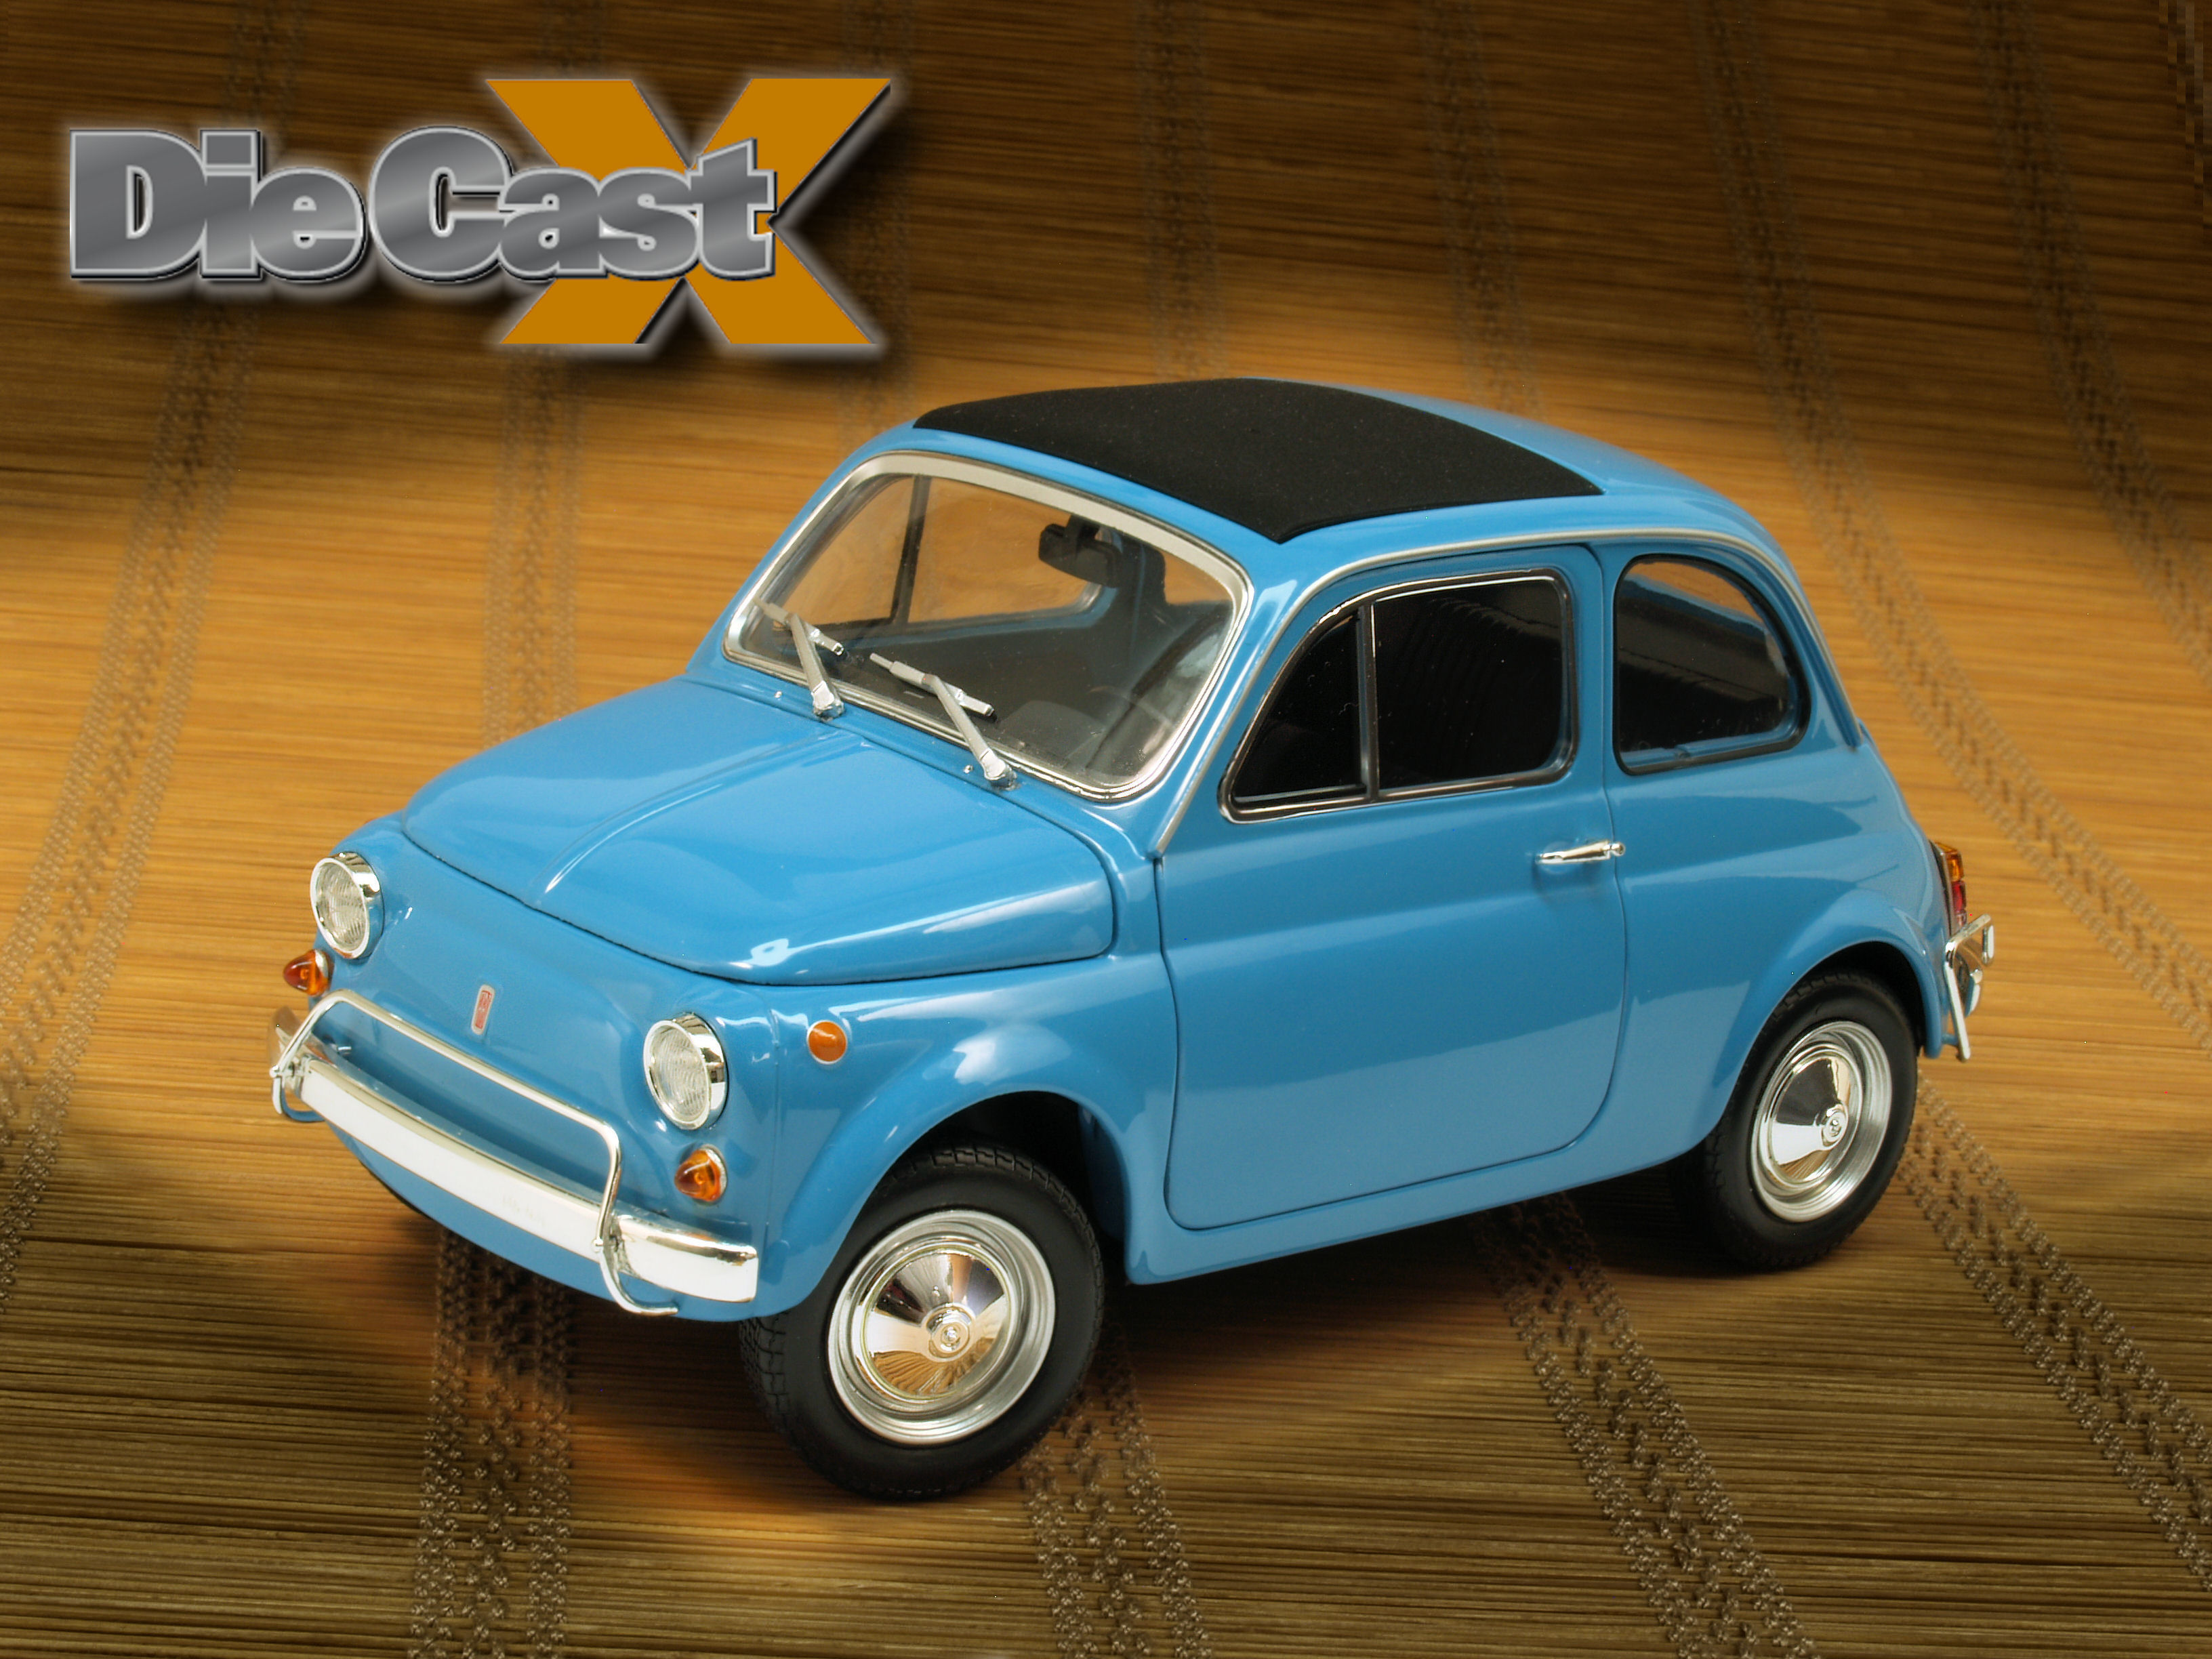 Minichamps 1:18 Fiat 500: Ciao, Baby